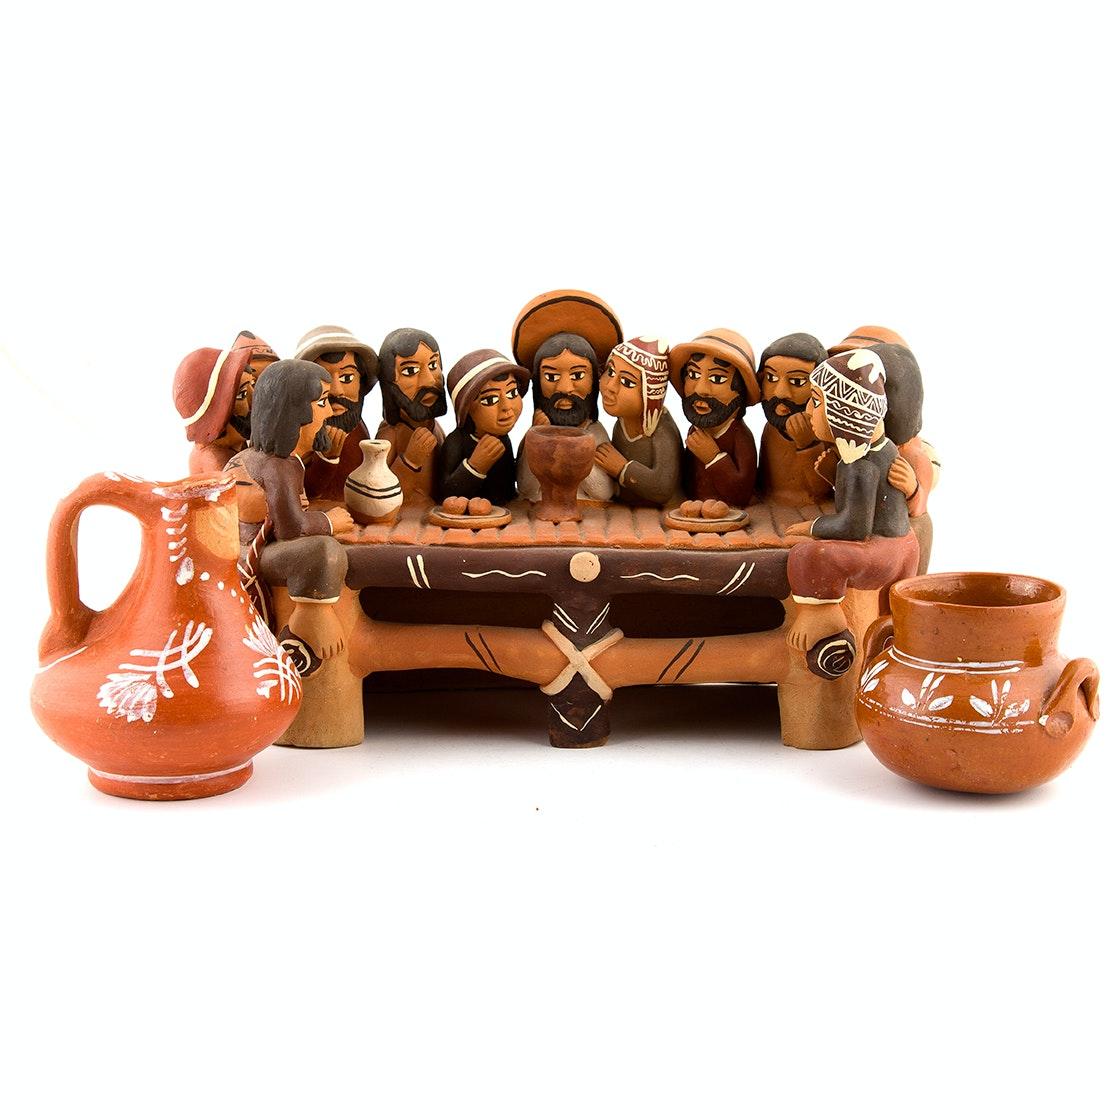 "Peruvian Pottery Including Folk Art Style ""Last Supper"""